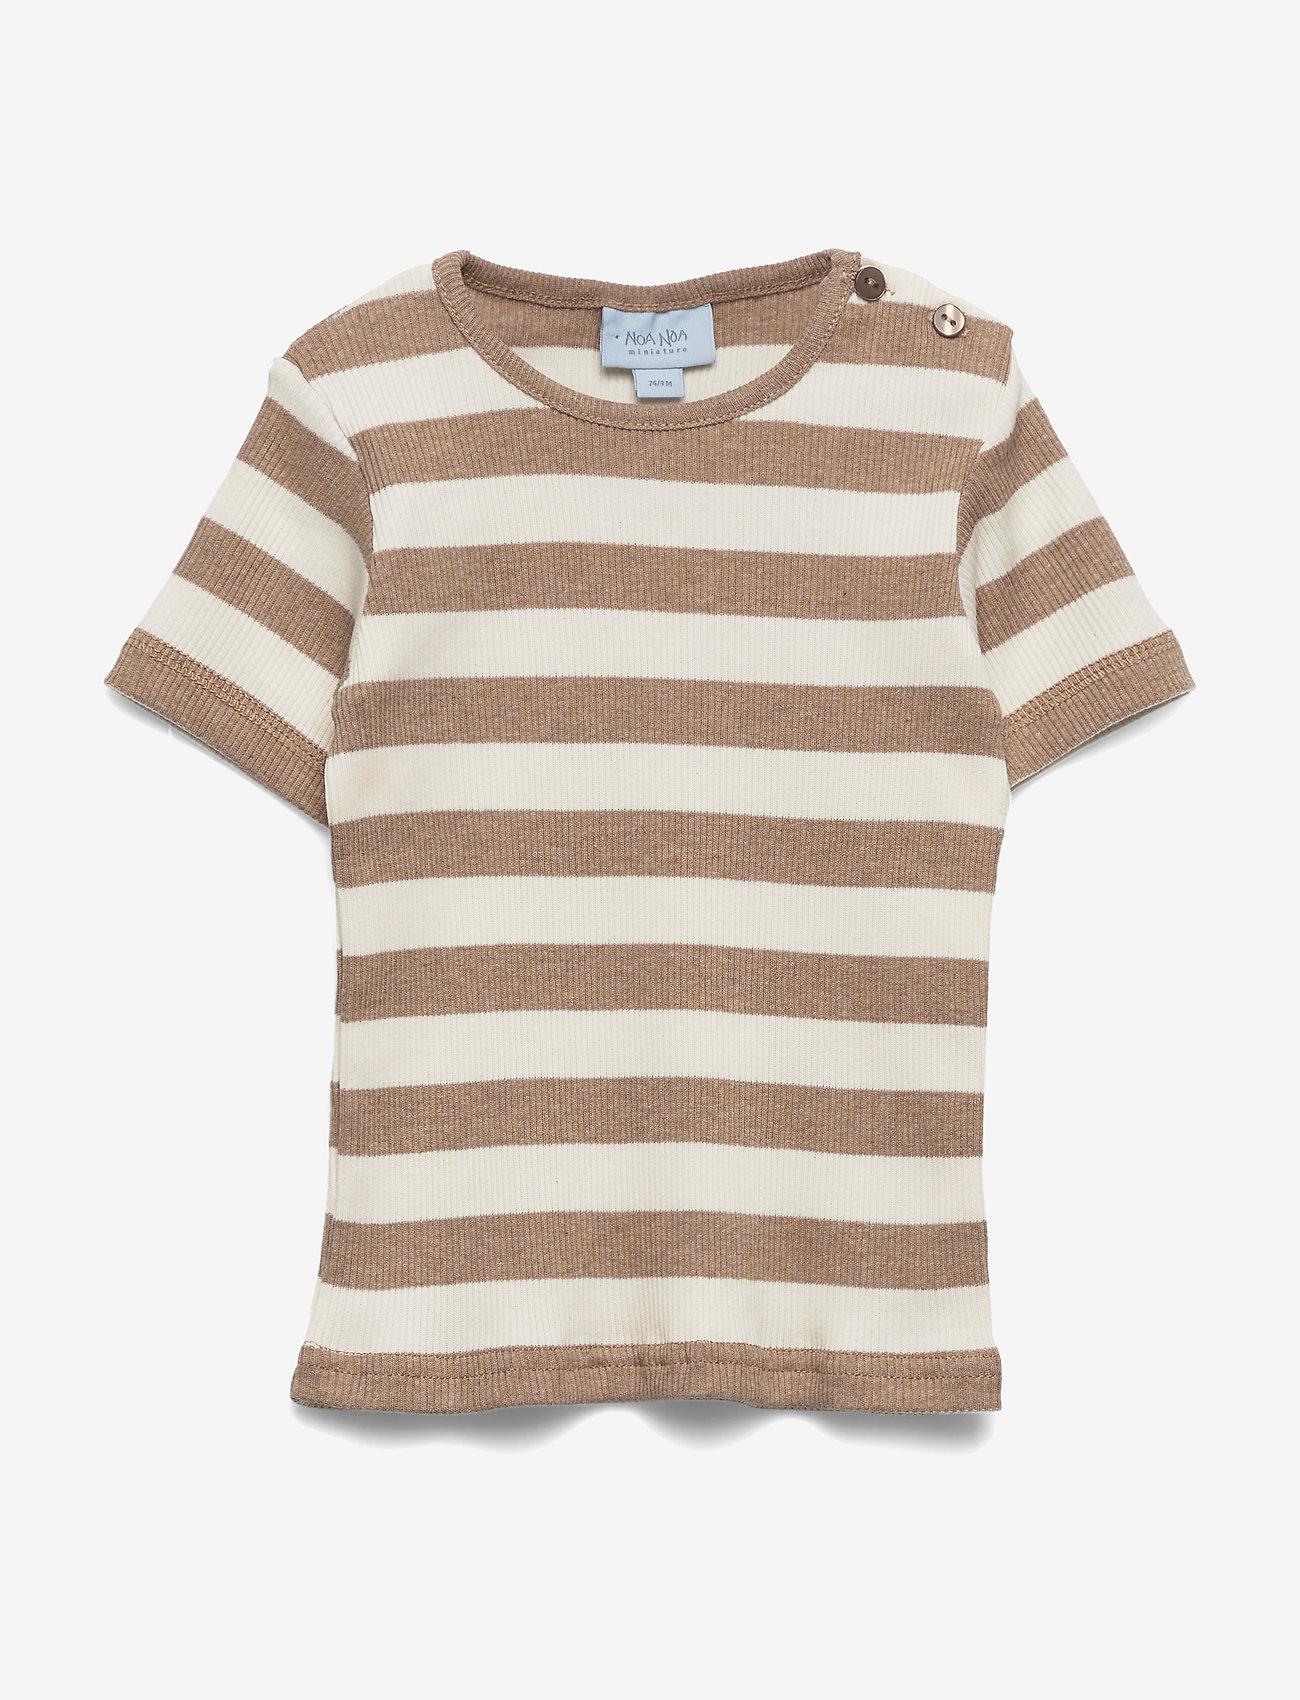 Noa Noa Miniature - T-shirt - short-sleeved - natural - 0